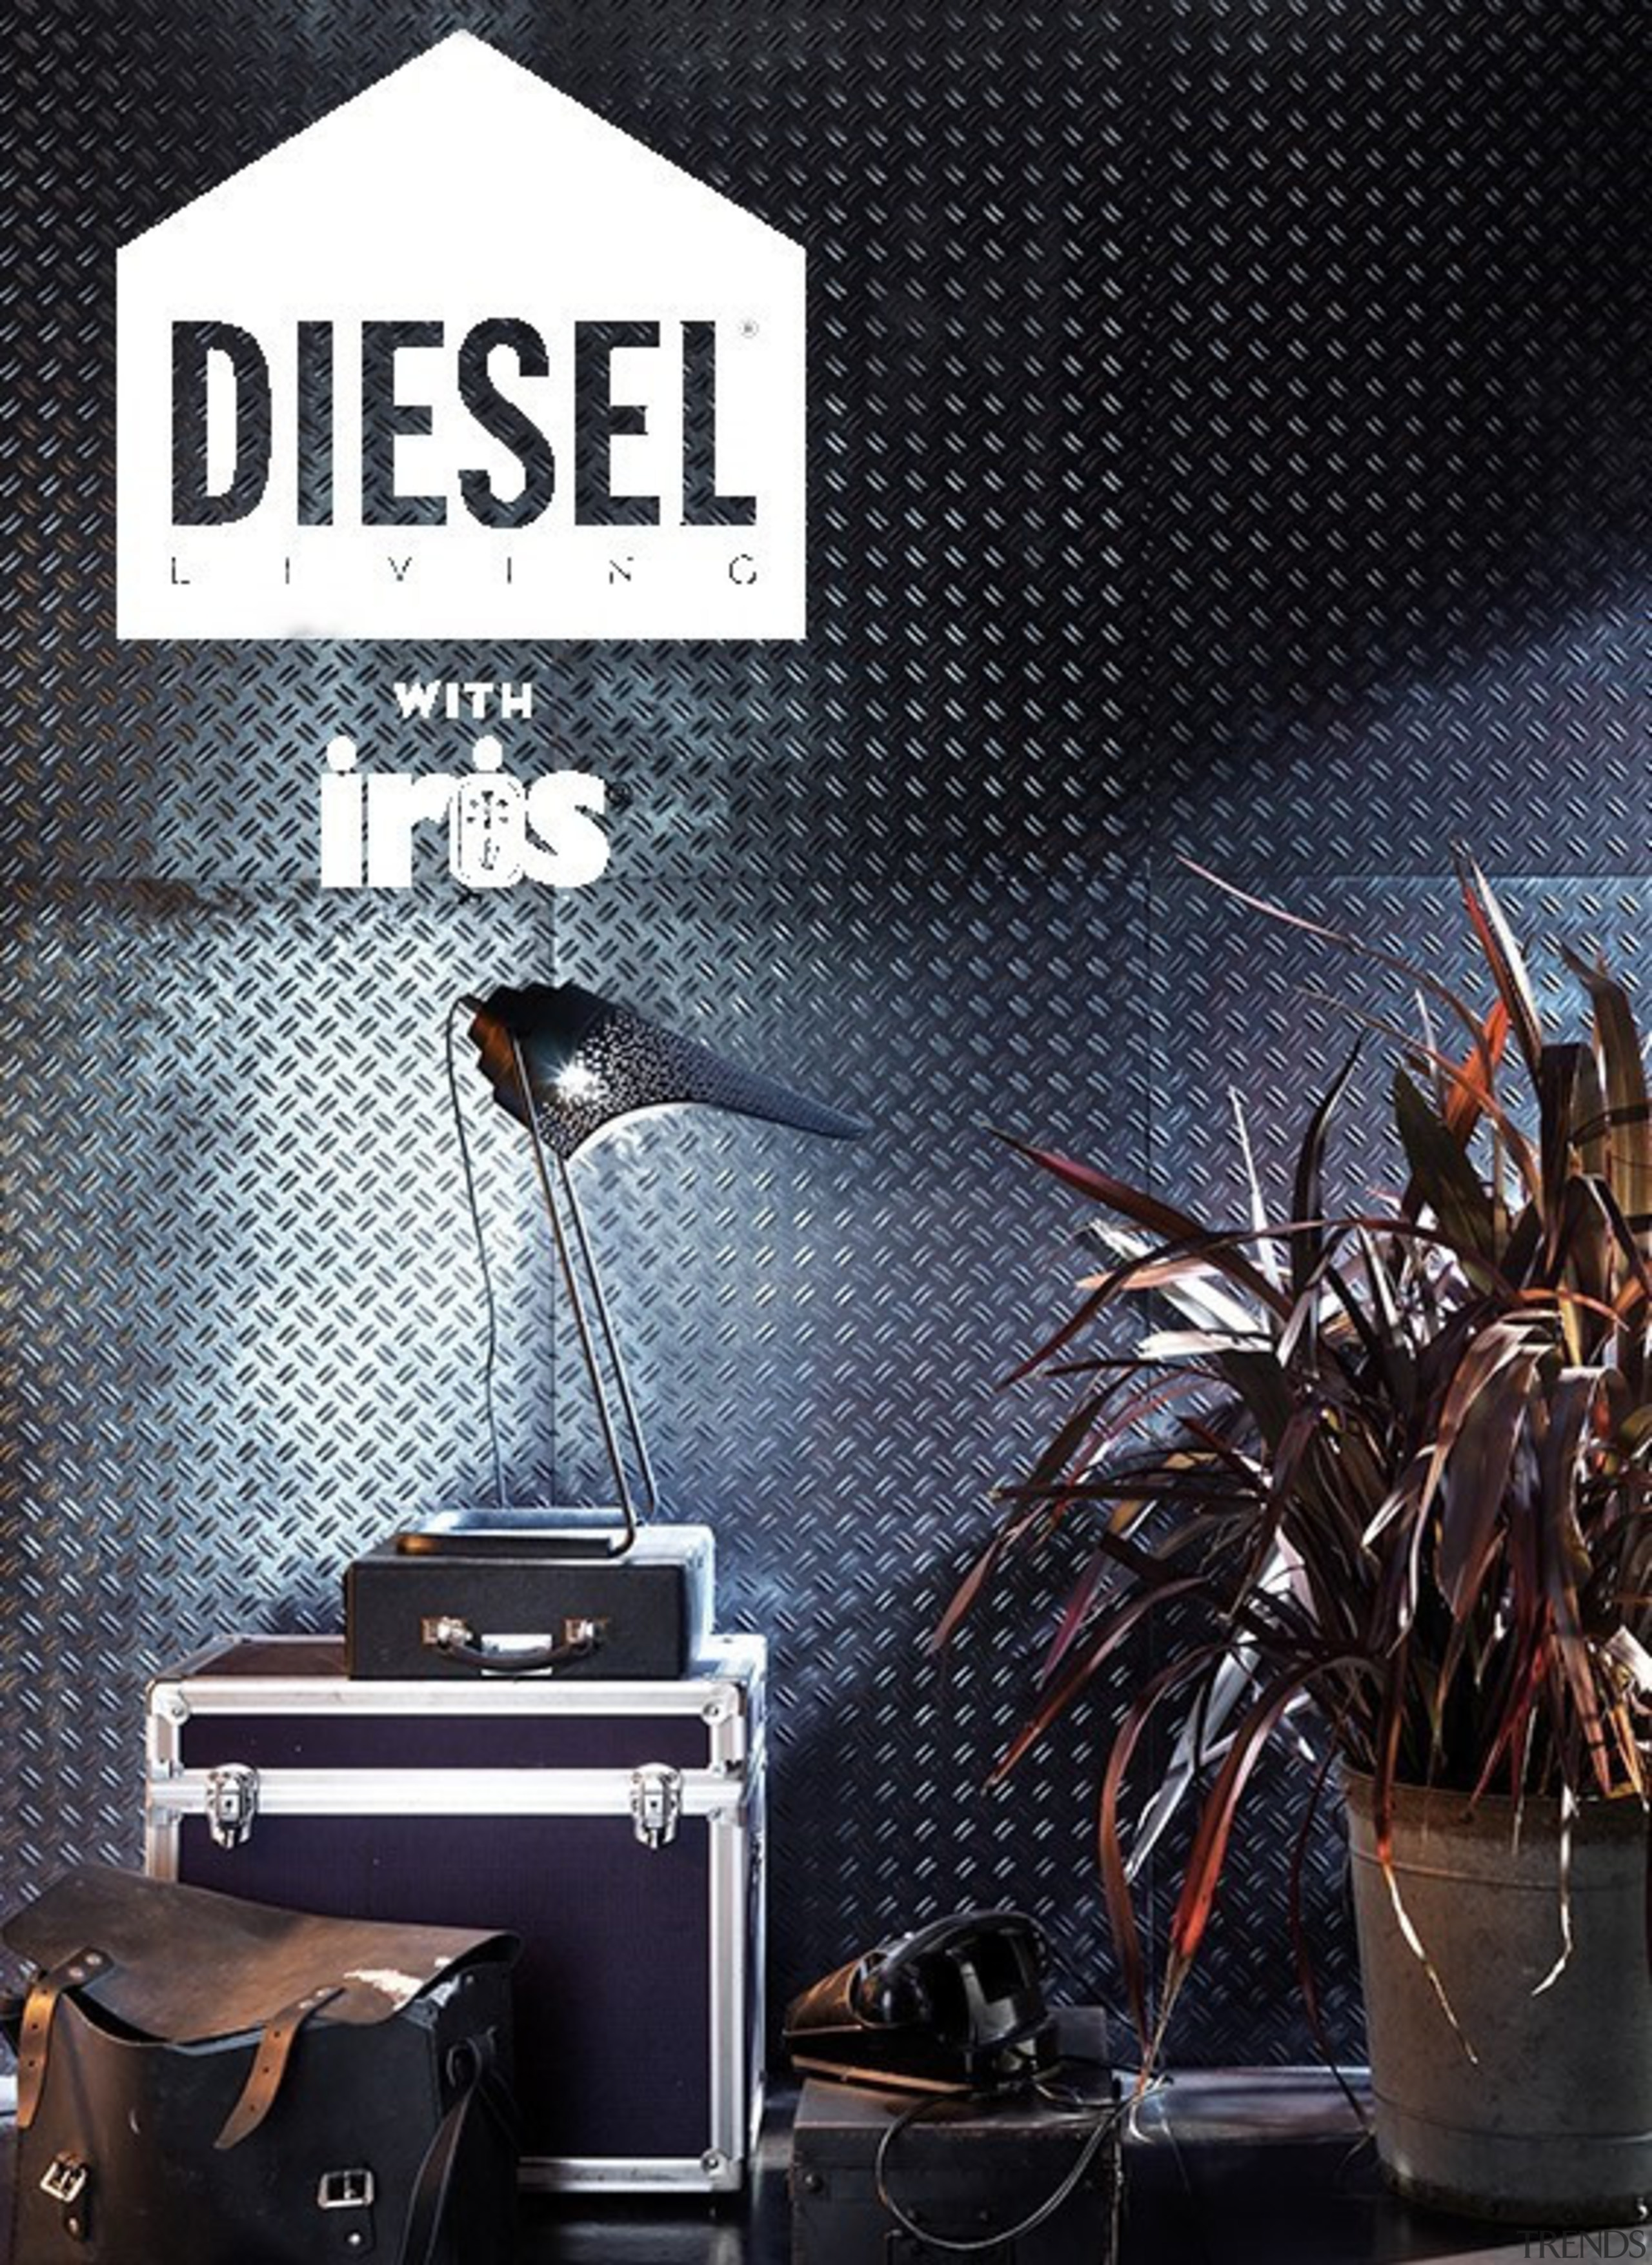 Diesel is no stranger to interior design partnerships, black